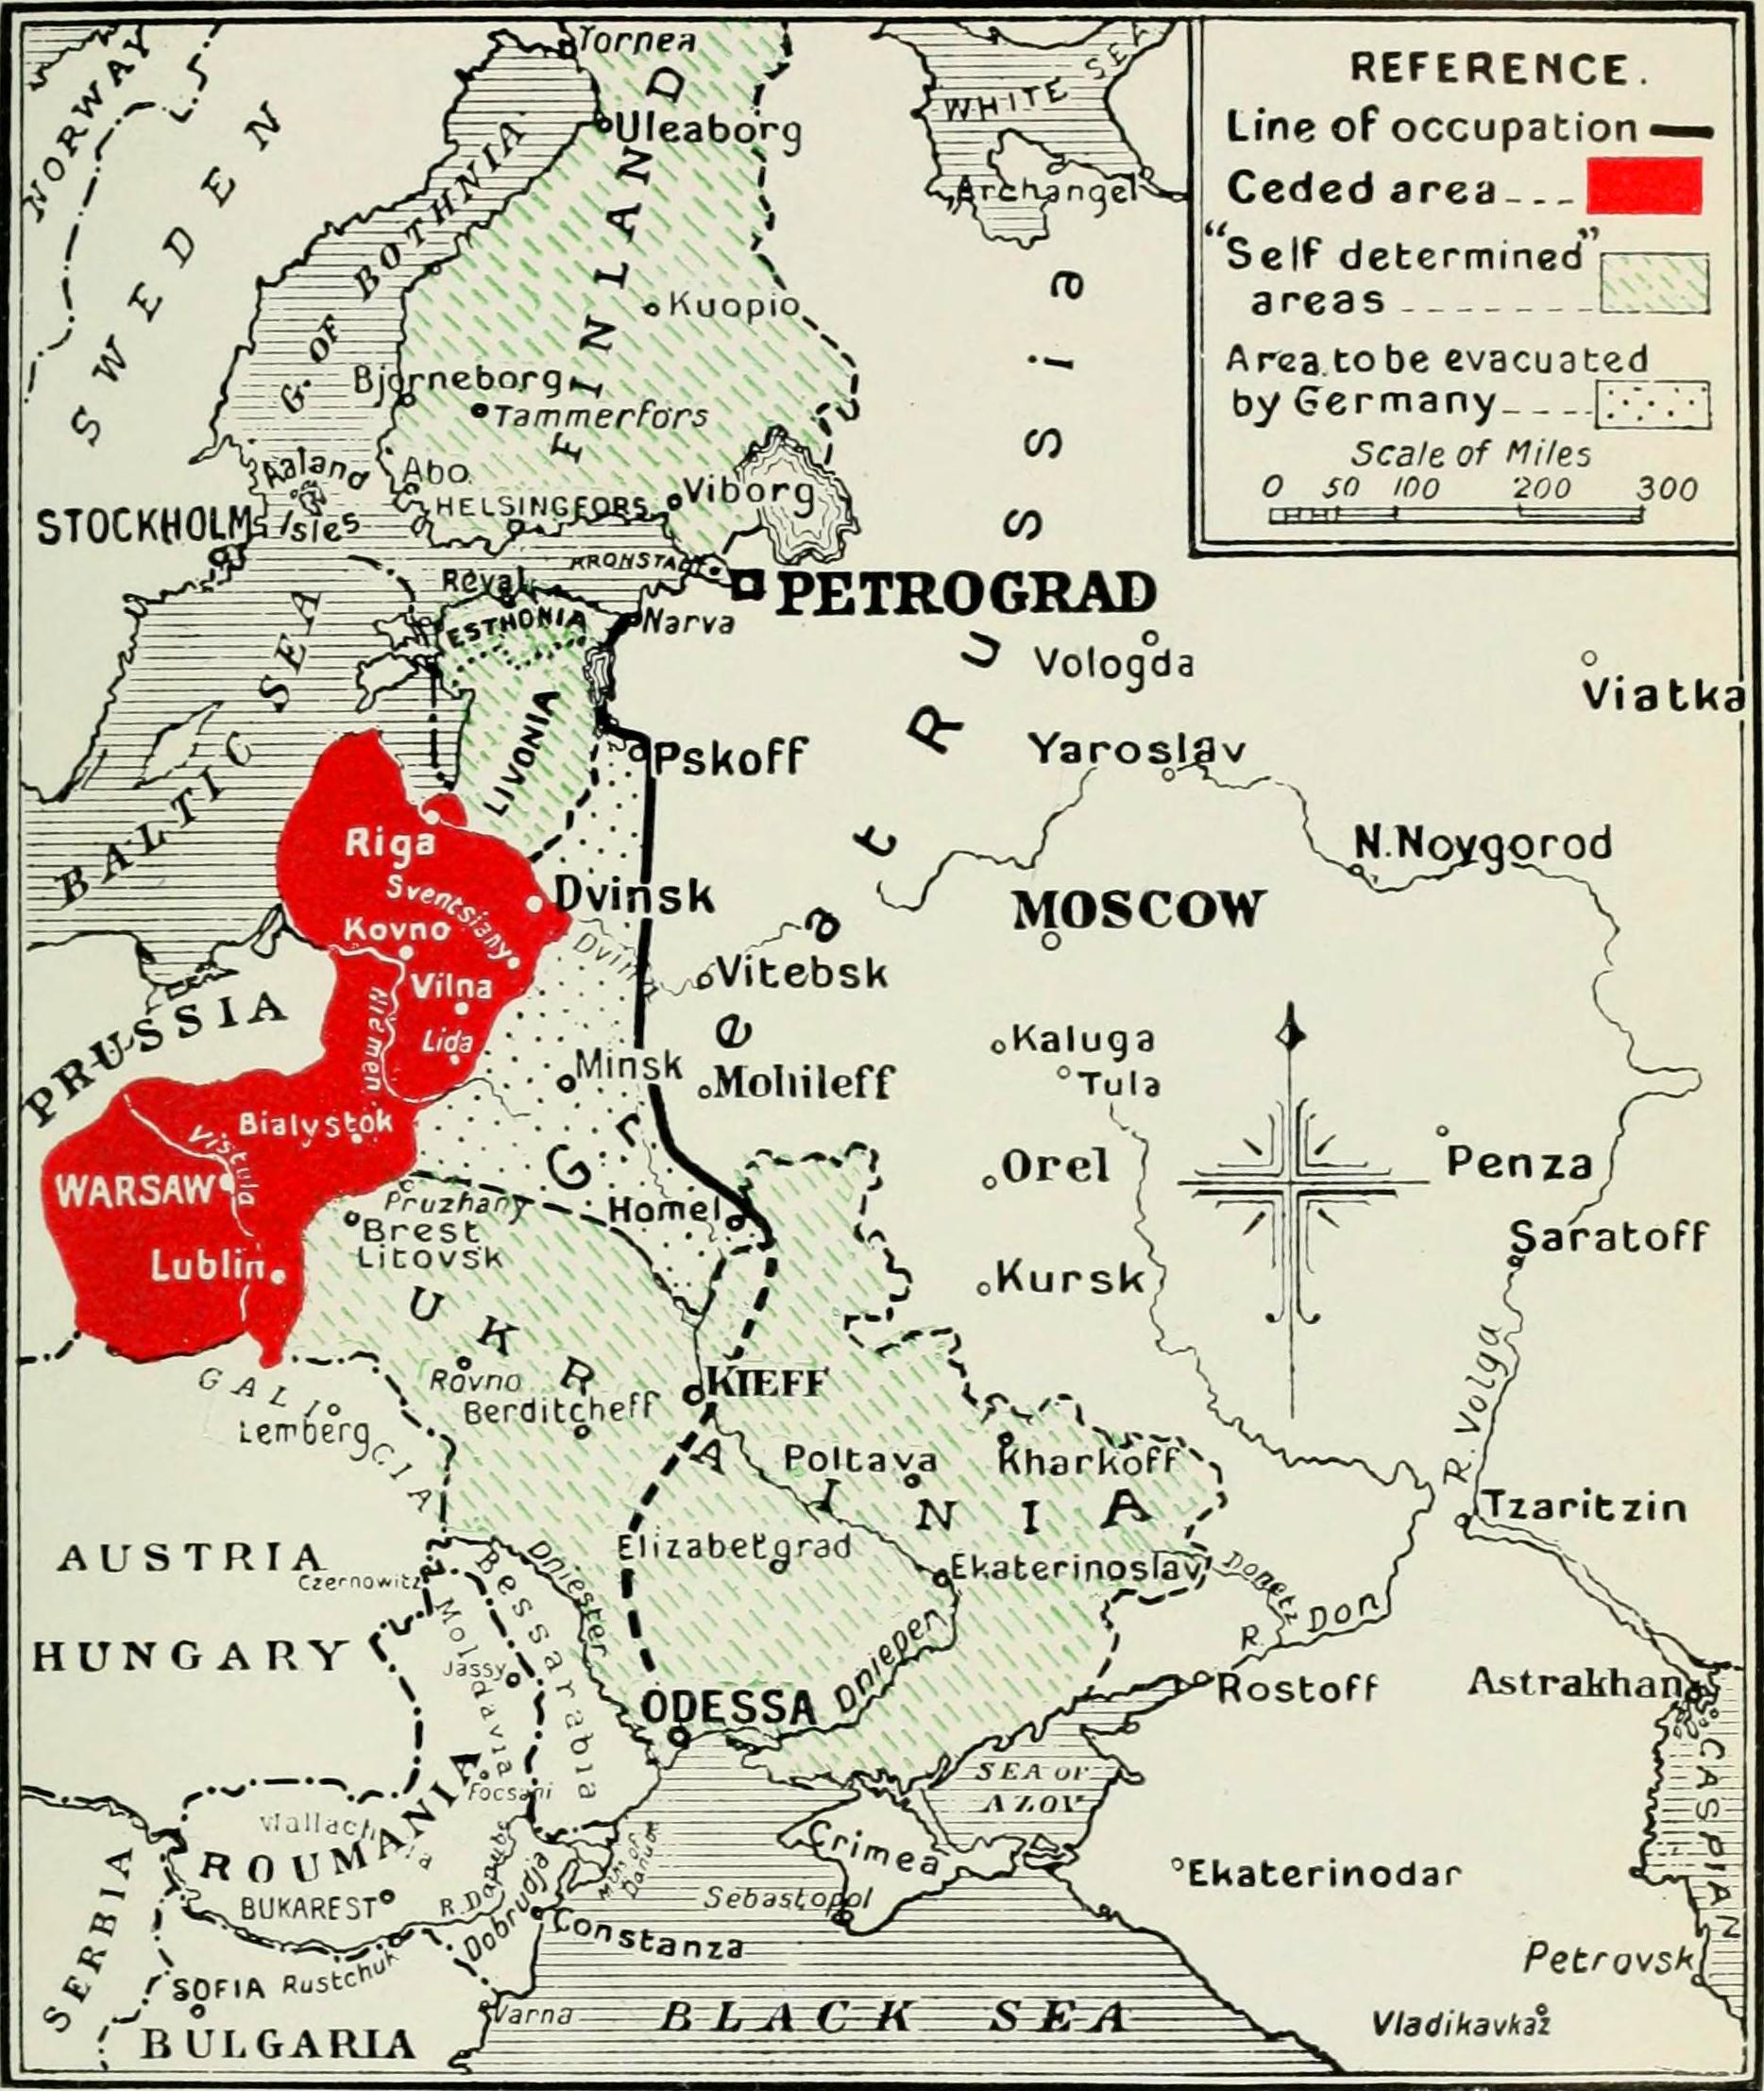 FileMap Treaty BrestLitovskjpg Wikimedia Commons